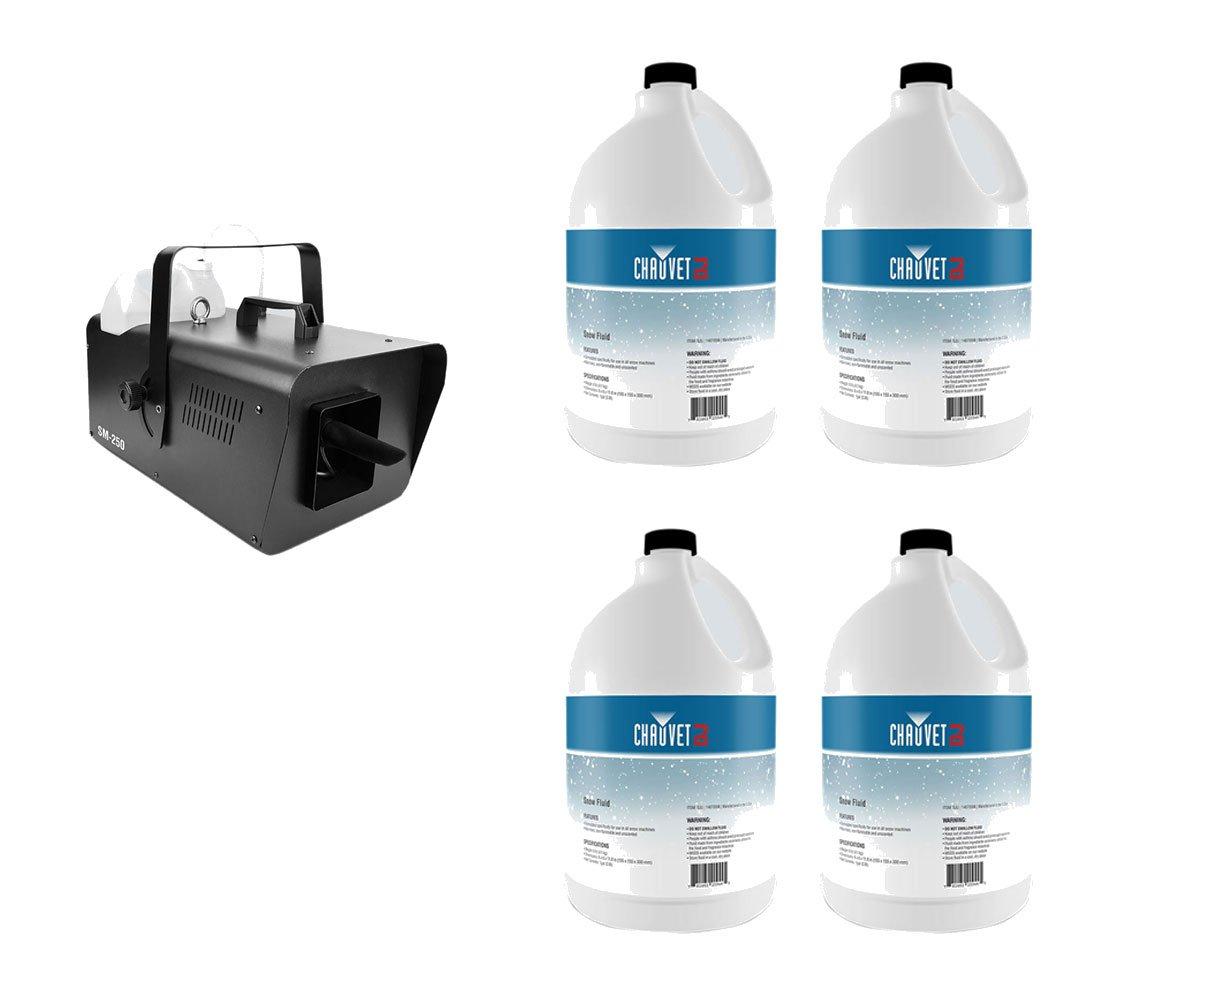 Chauvet SM-250 High-Output Snow Machine + 4x Snow Fluid Gallon